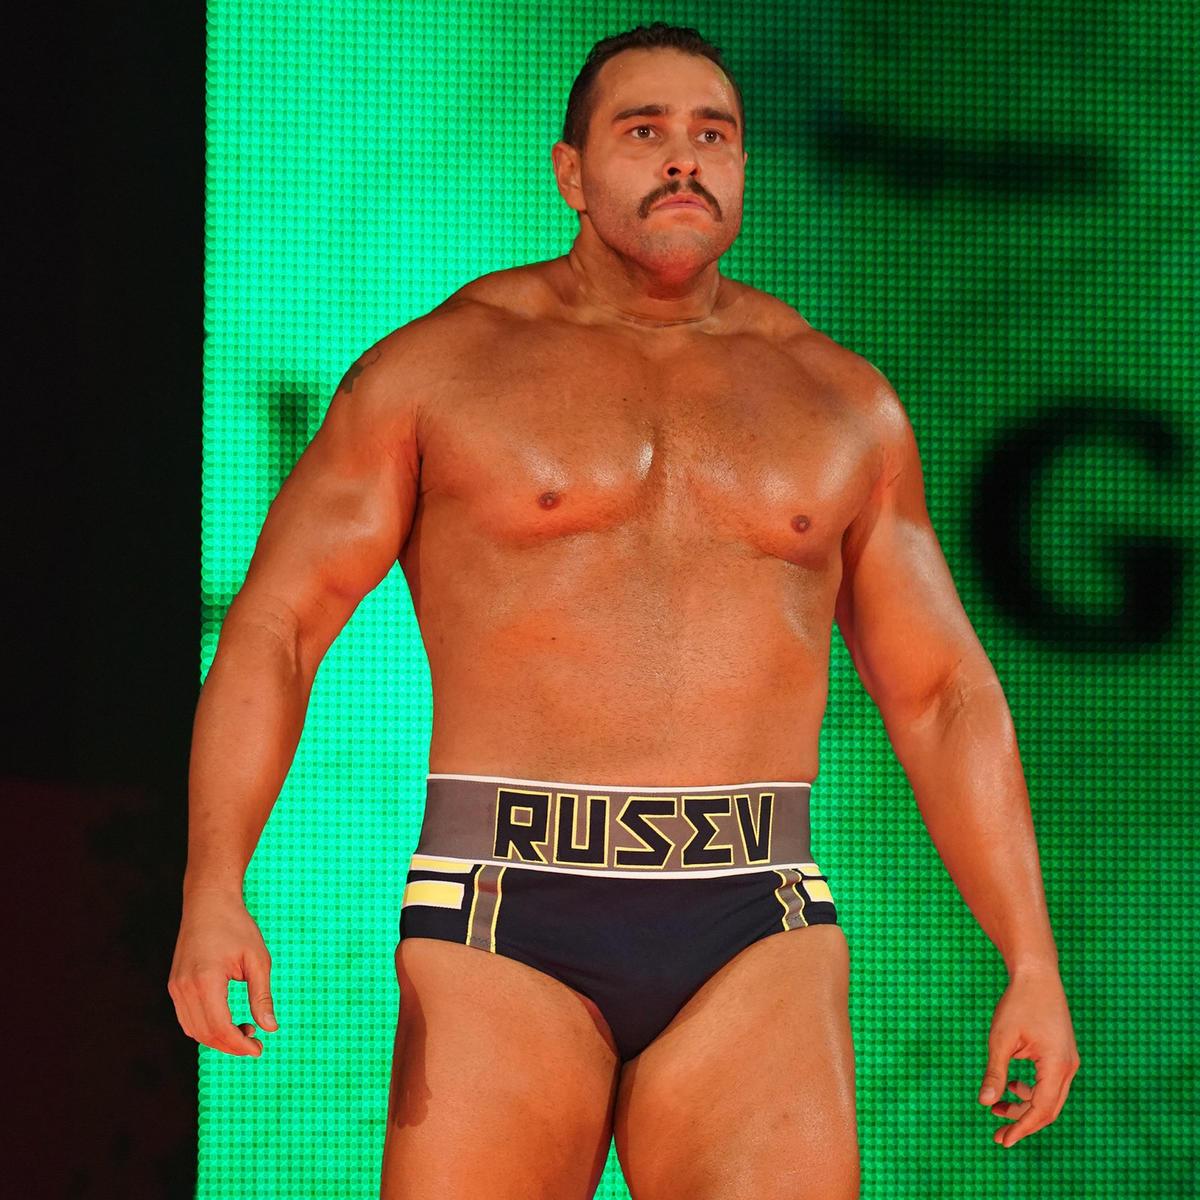 ... Rusev ?!